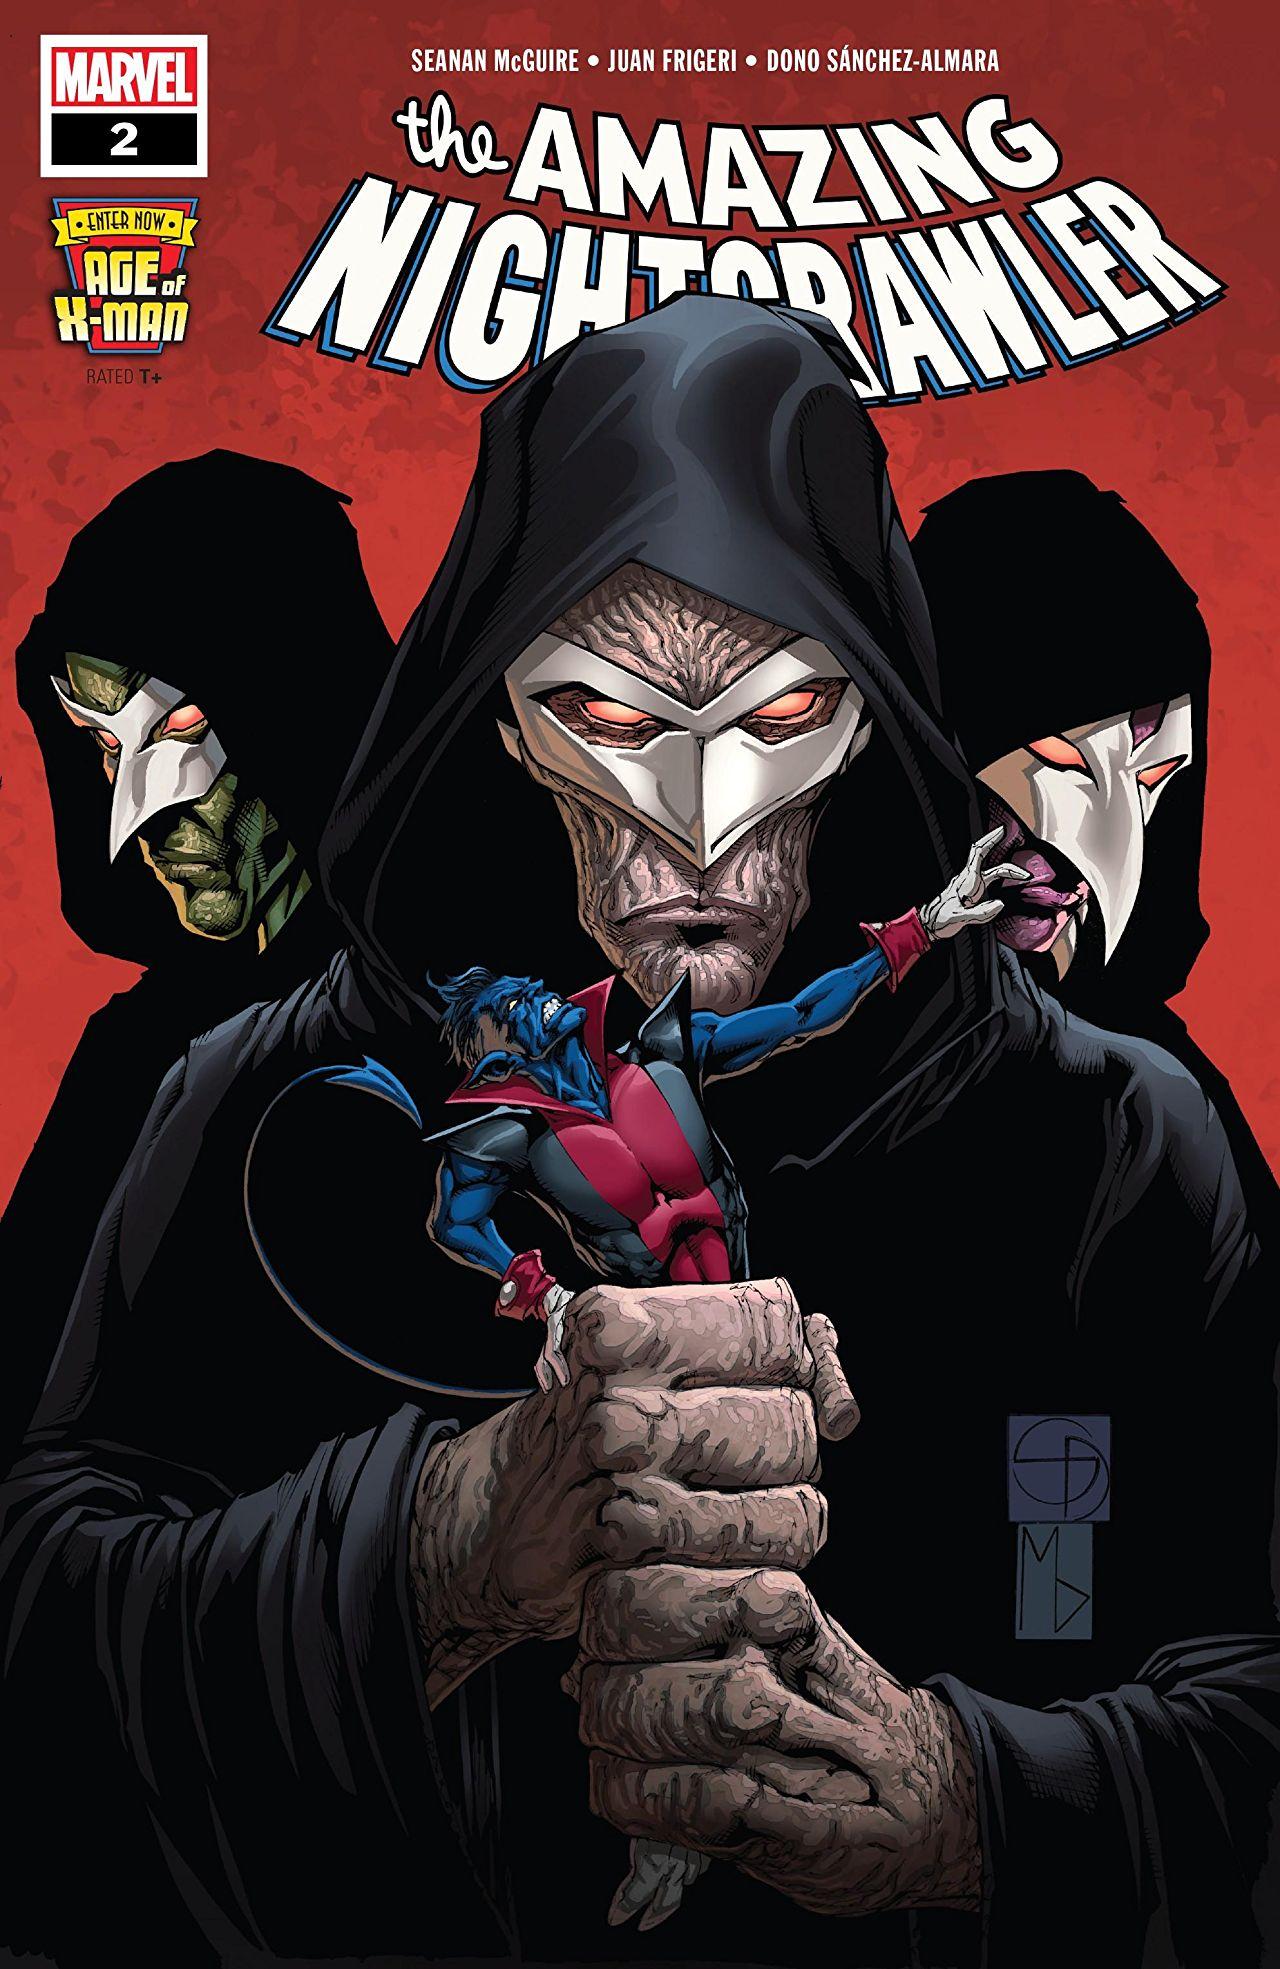 Age of X-Man: The Amazing Nightcrawler Vol 1 2